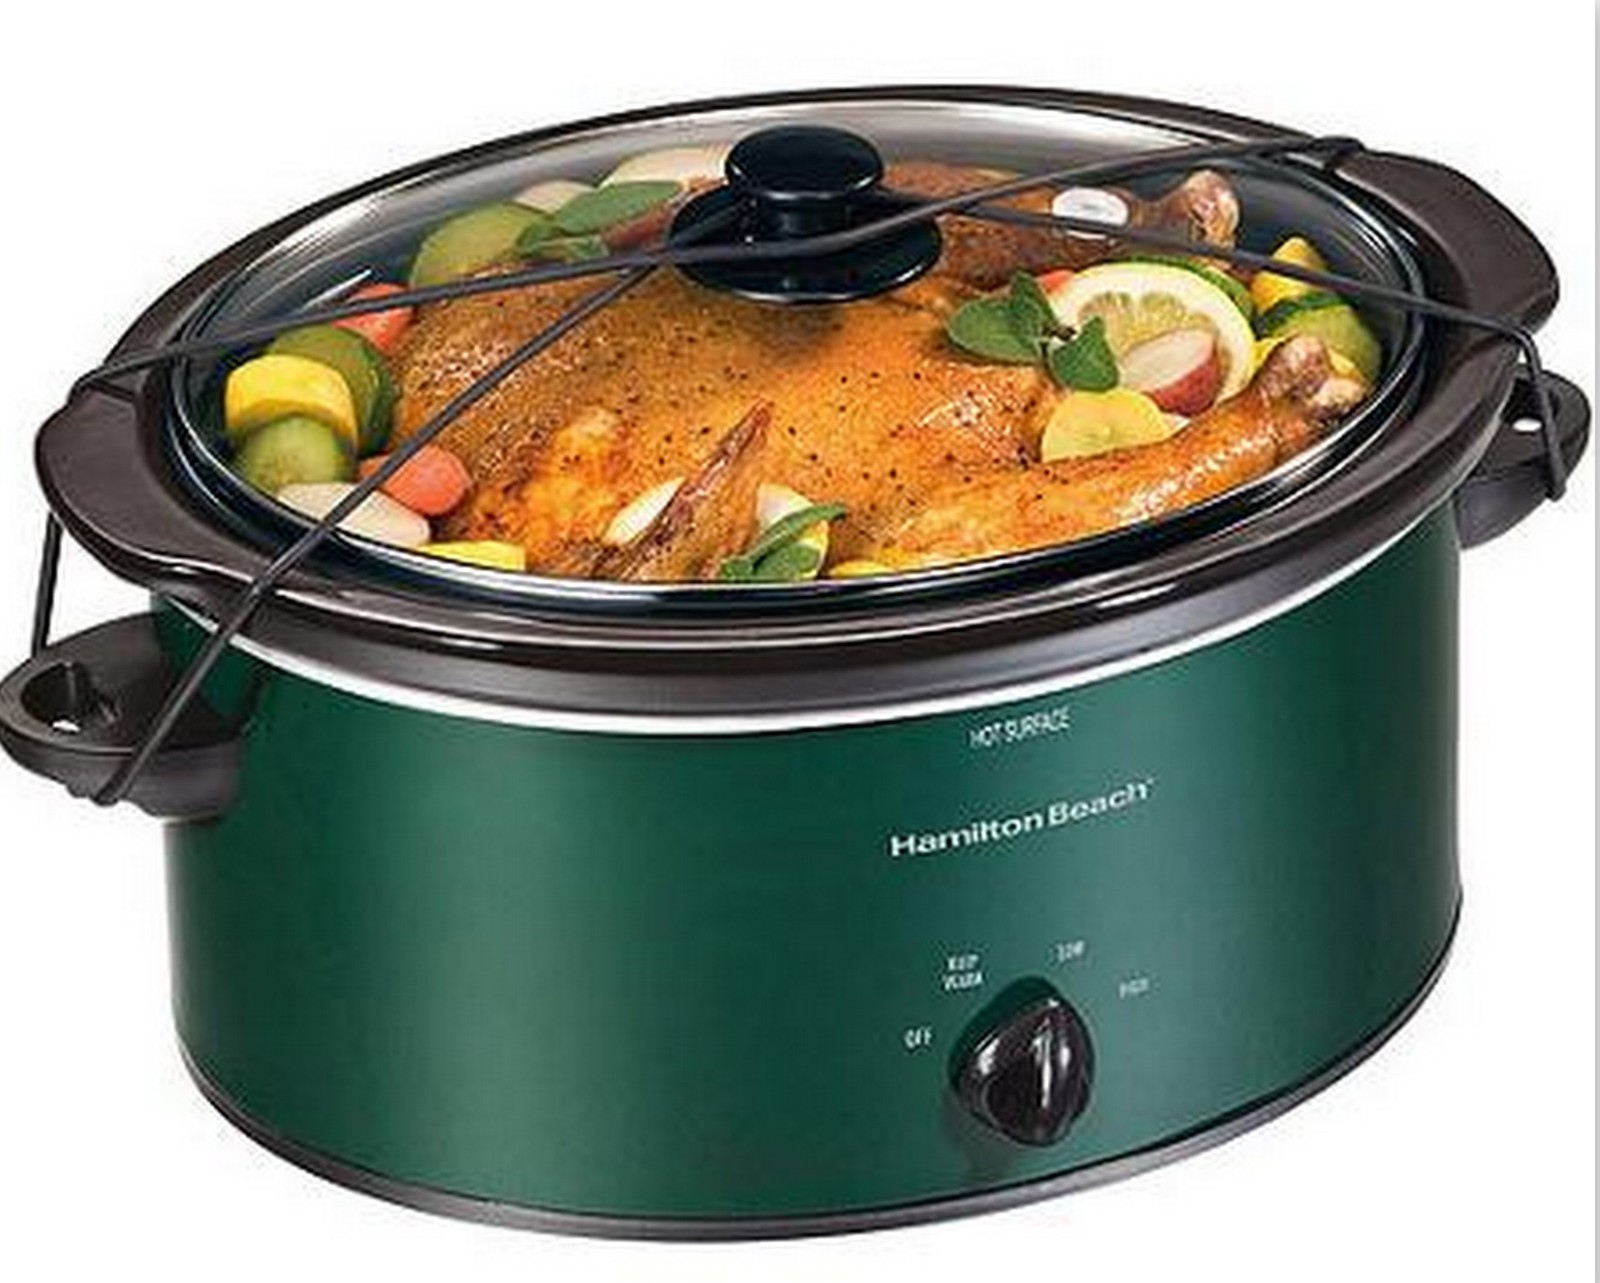 Hamilton Beach Green 5 Quart Slow Cooker Crock Pot With